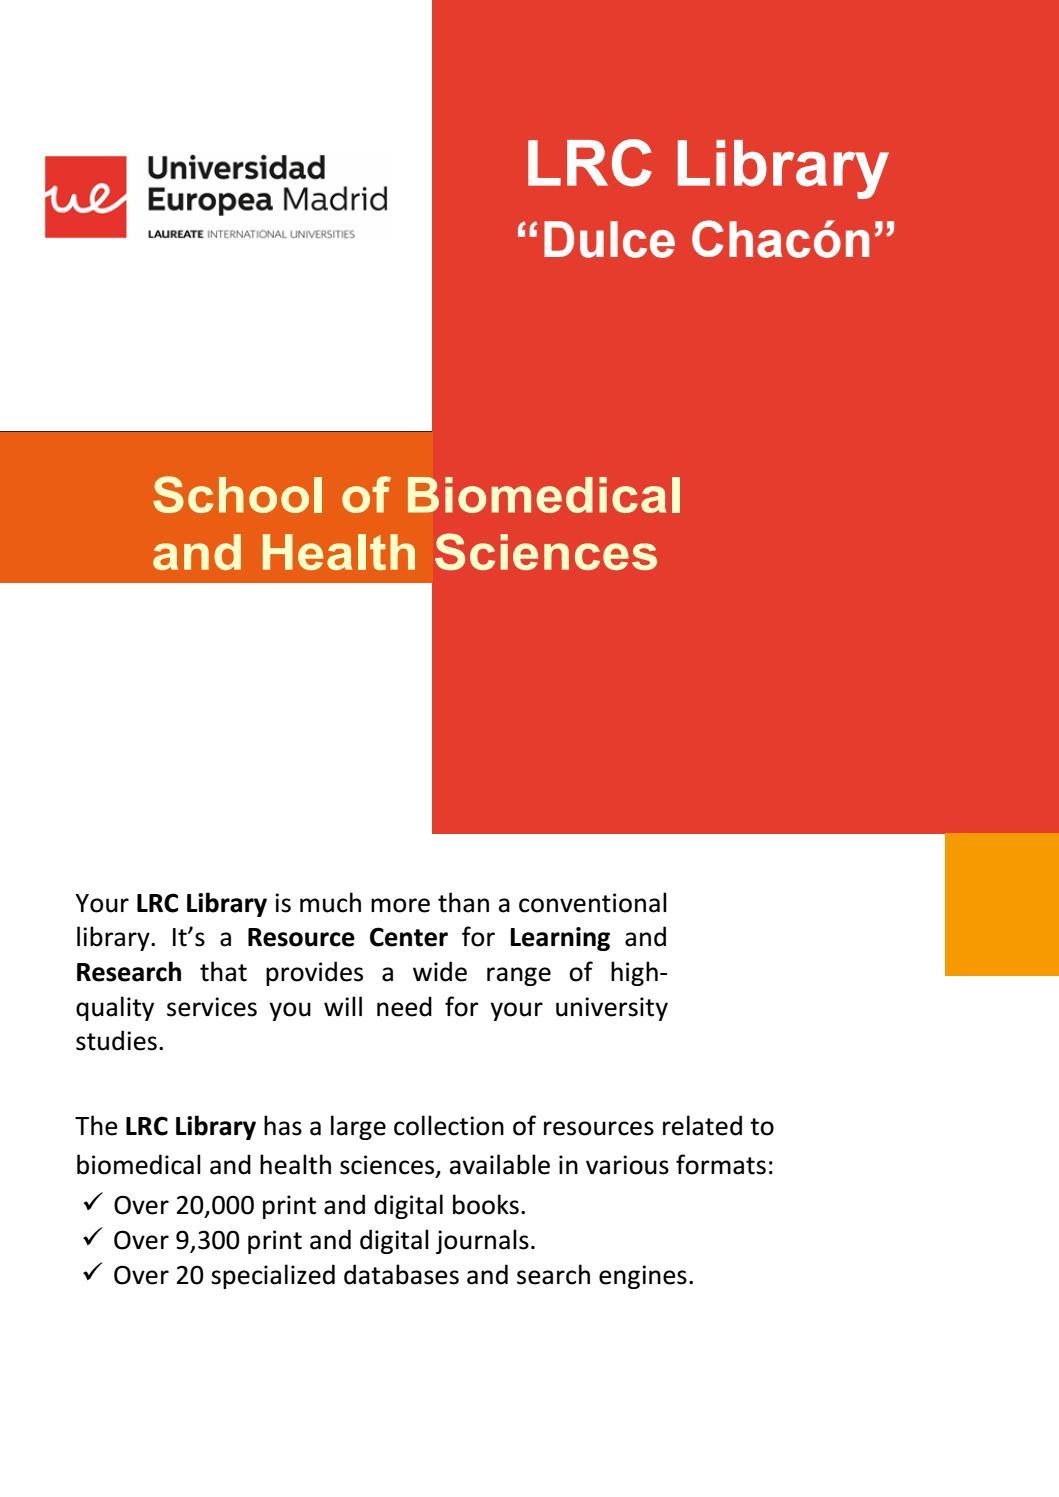 School of Biomedical and Health Sciences brochure by Biblioteca CRAI Dulce  Chacón. Universidad Europea de Madrid - issuu 93b6533899